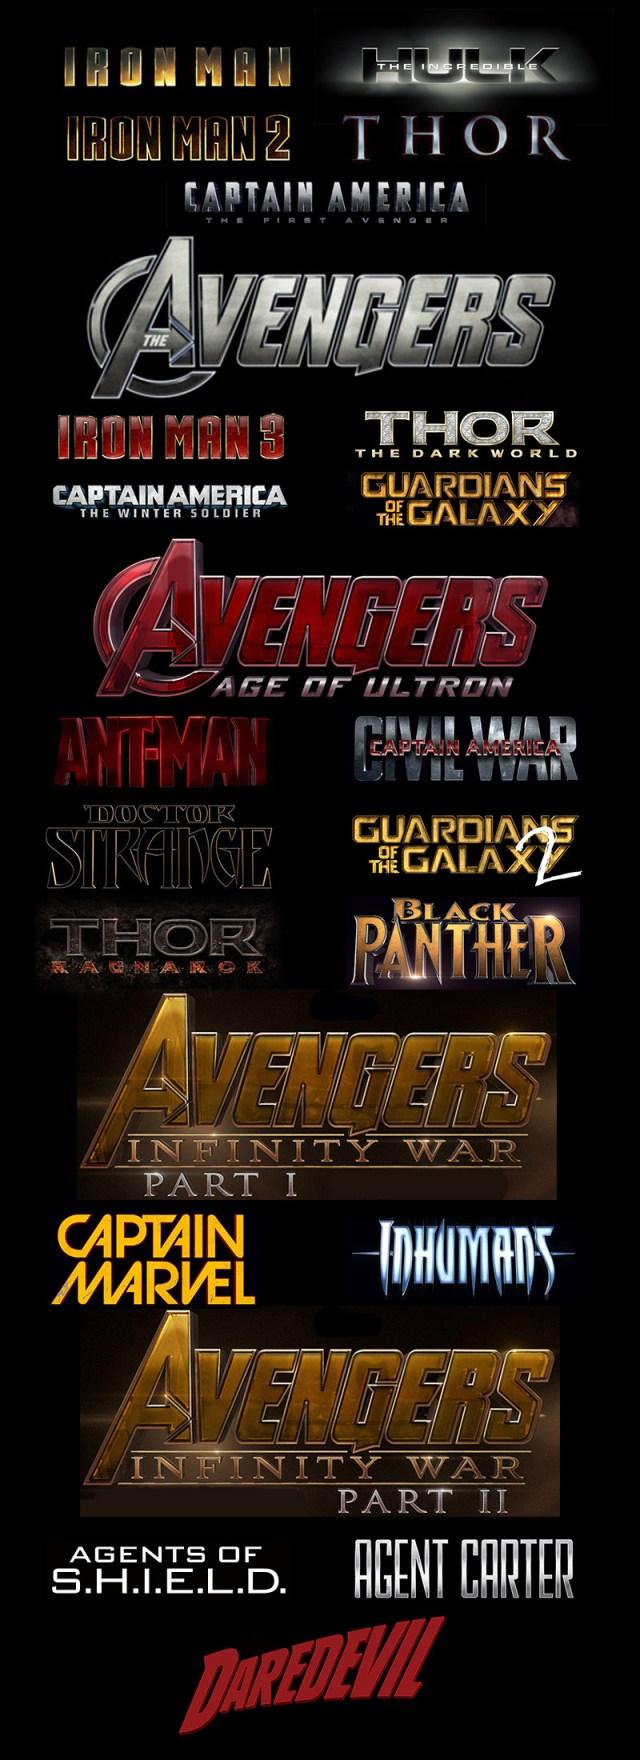 The Movies of Marvel.jpg